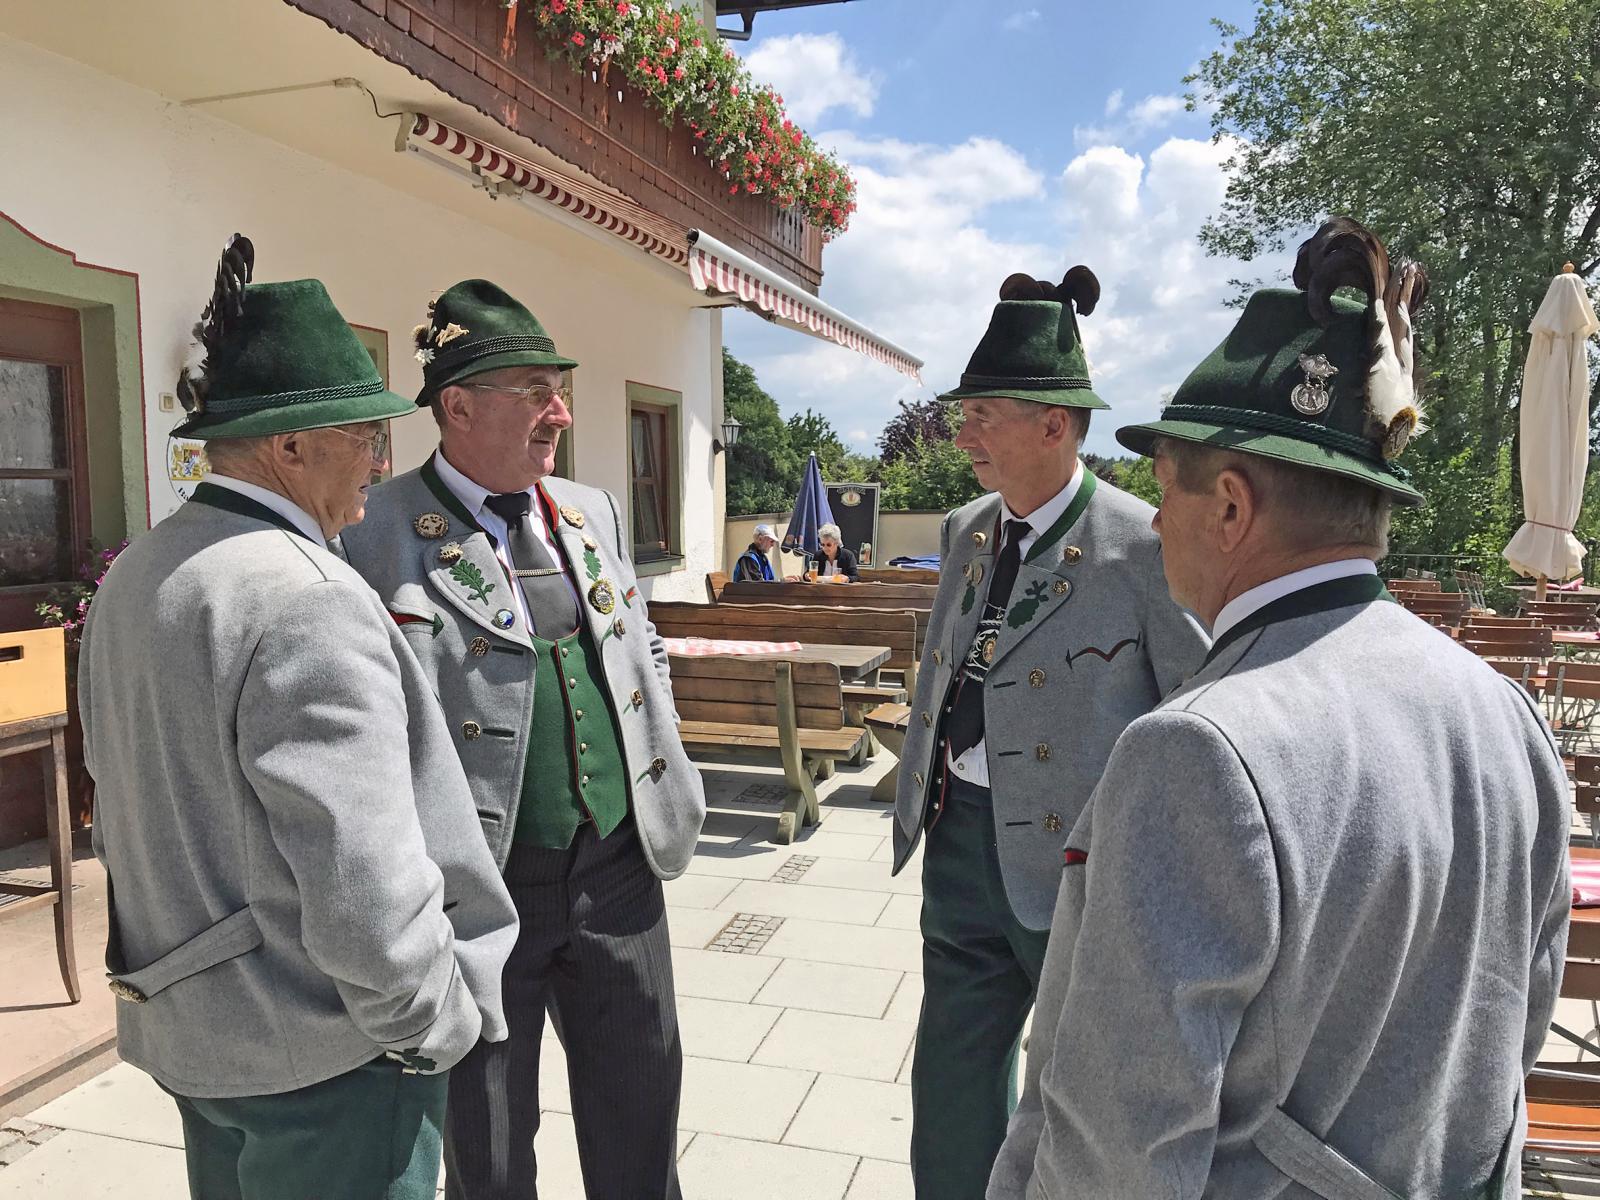 Beerdigung Ehrenvorstand Rupert Sonnenhuber, Amerang (6)